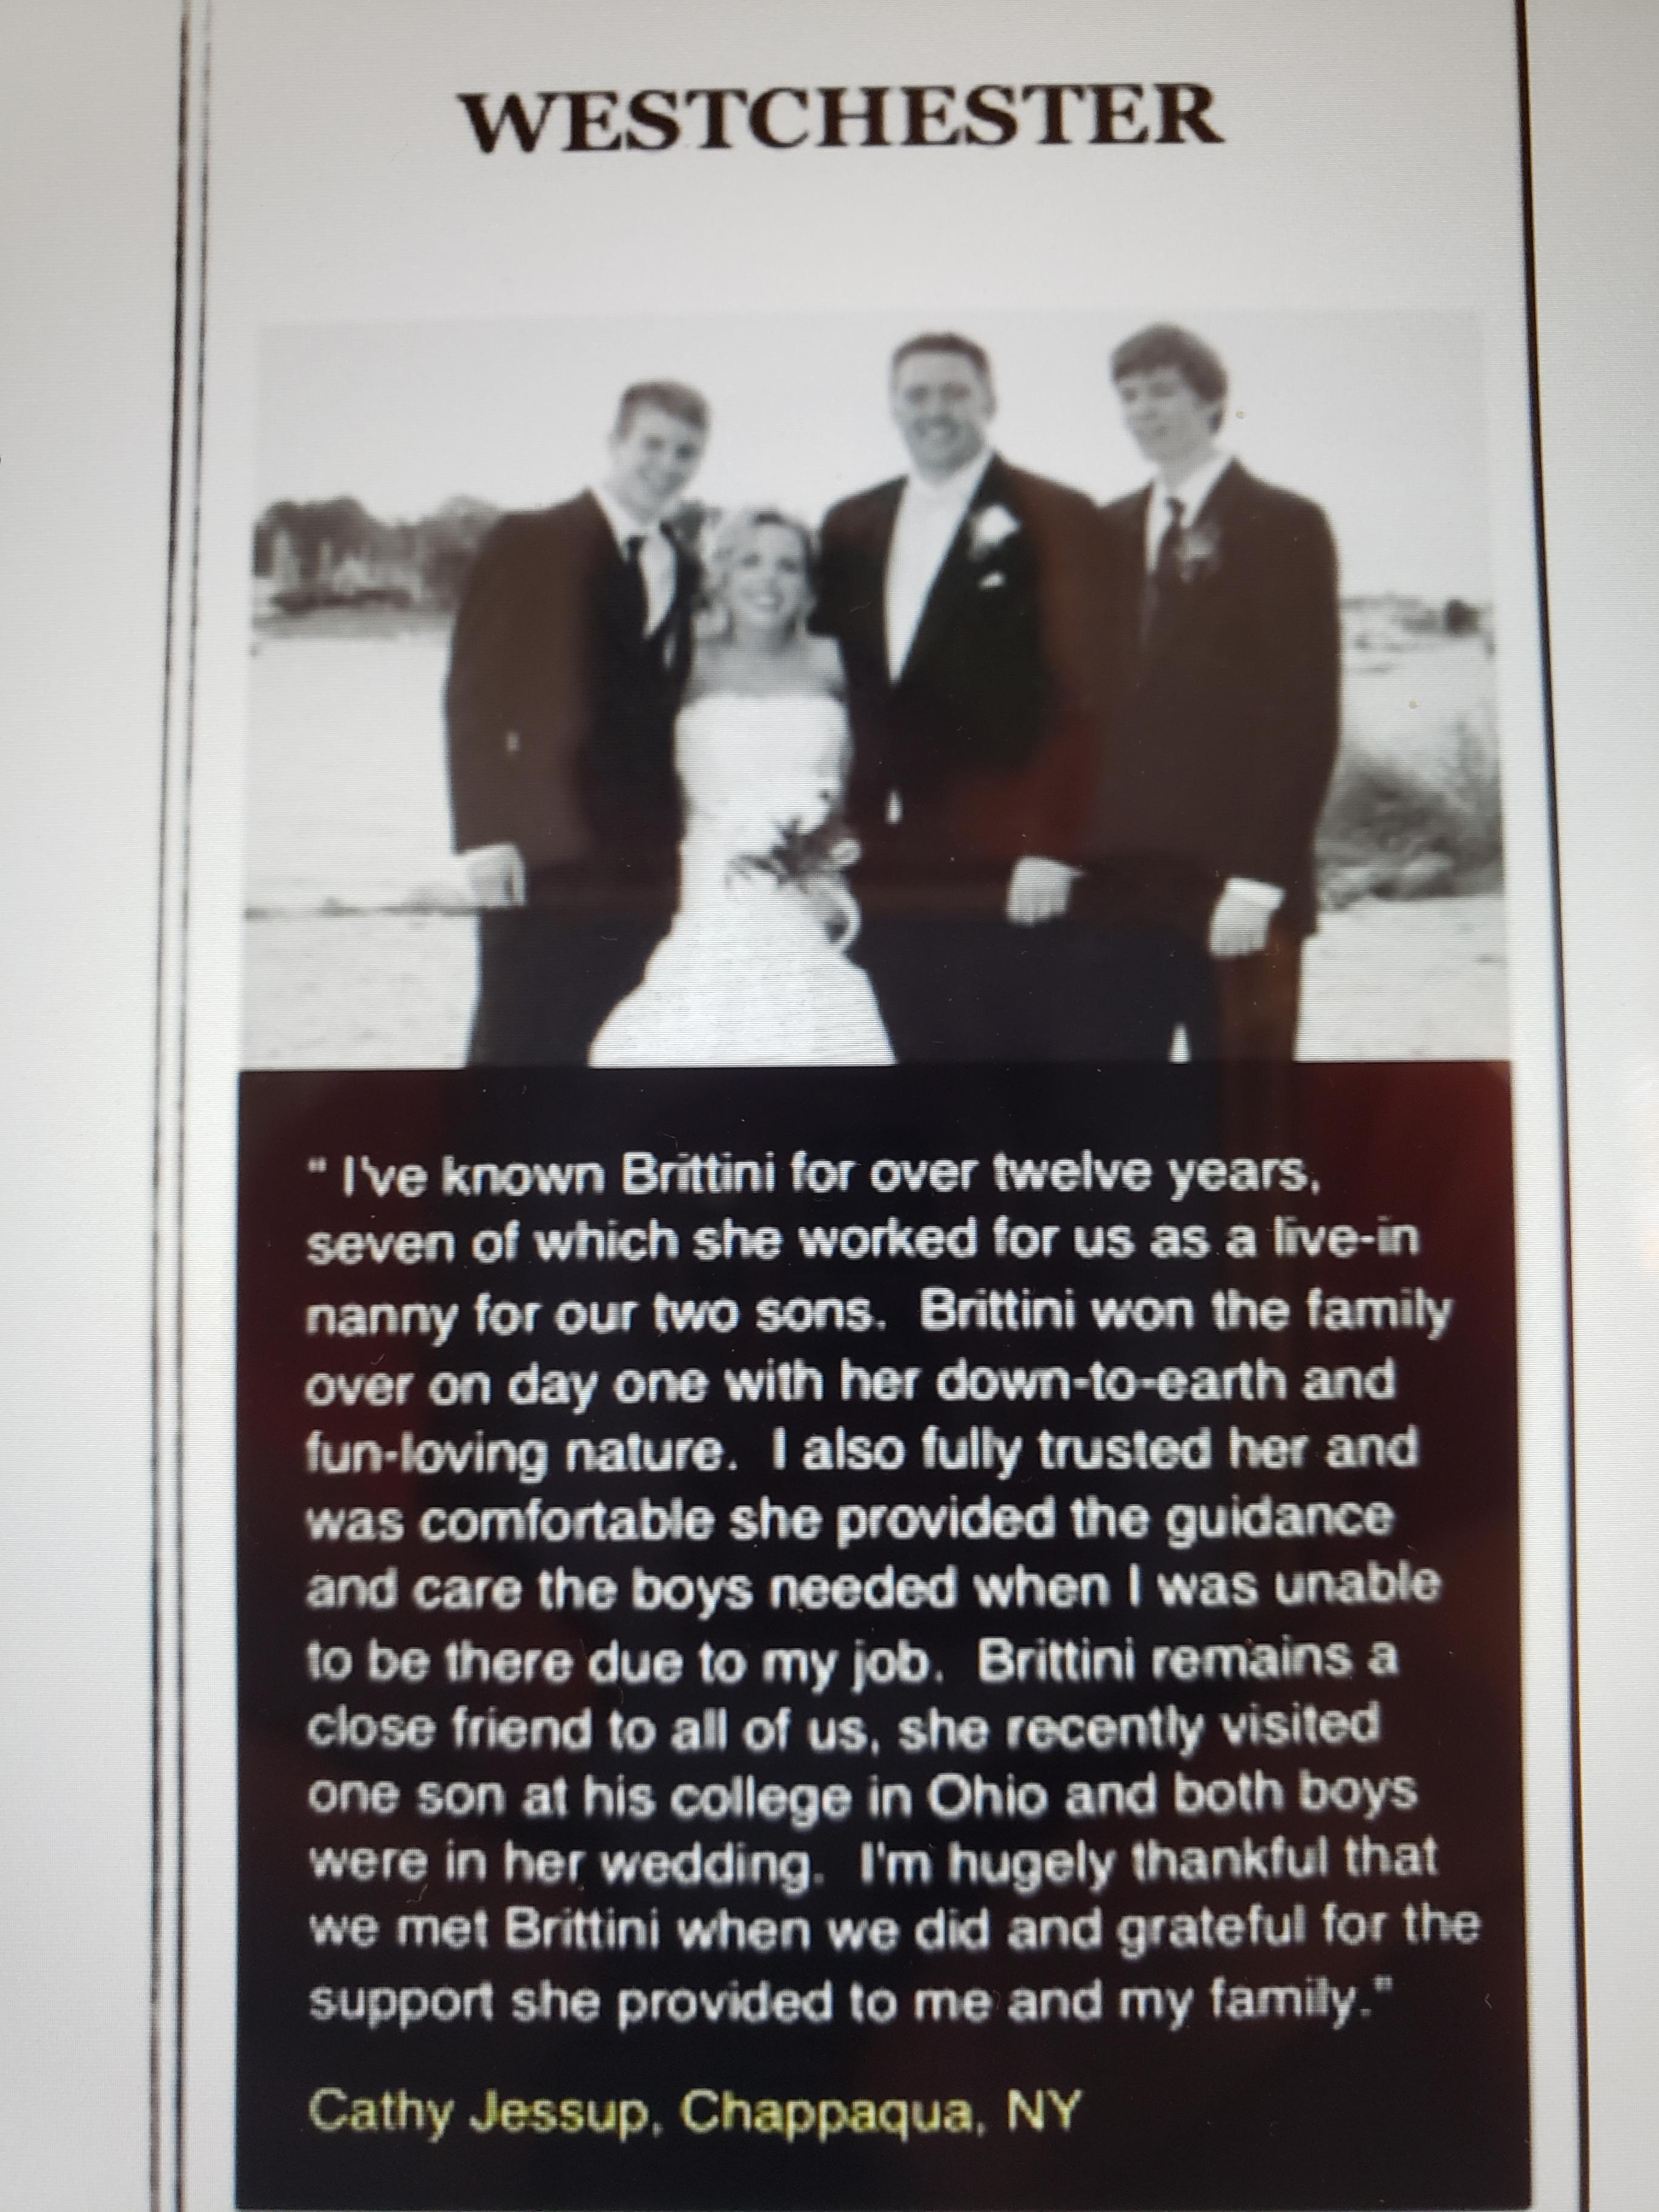 Testimonial from Cathy J.